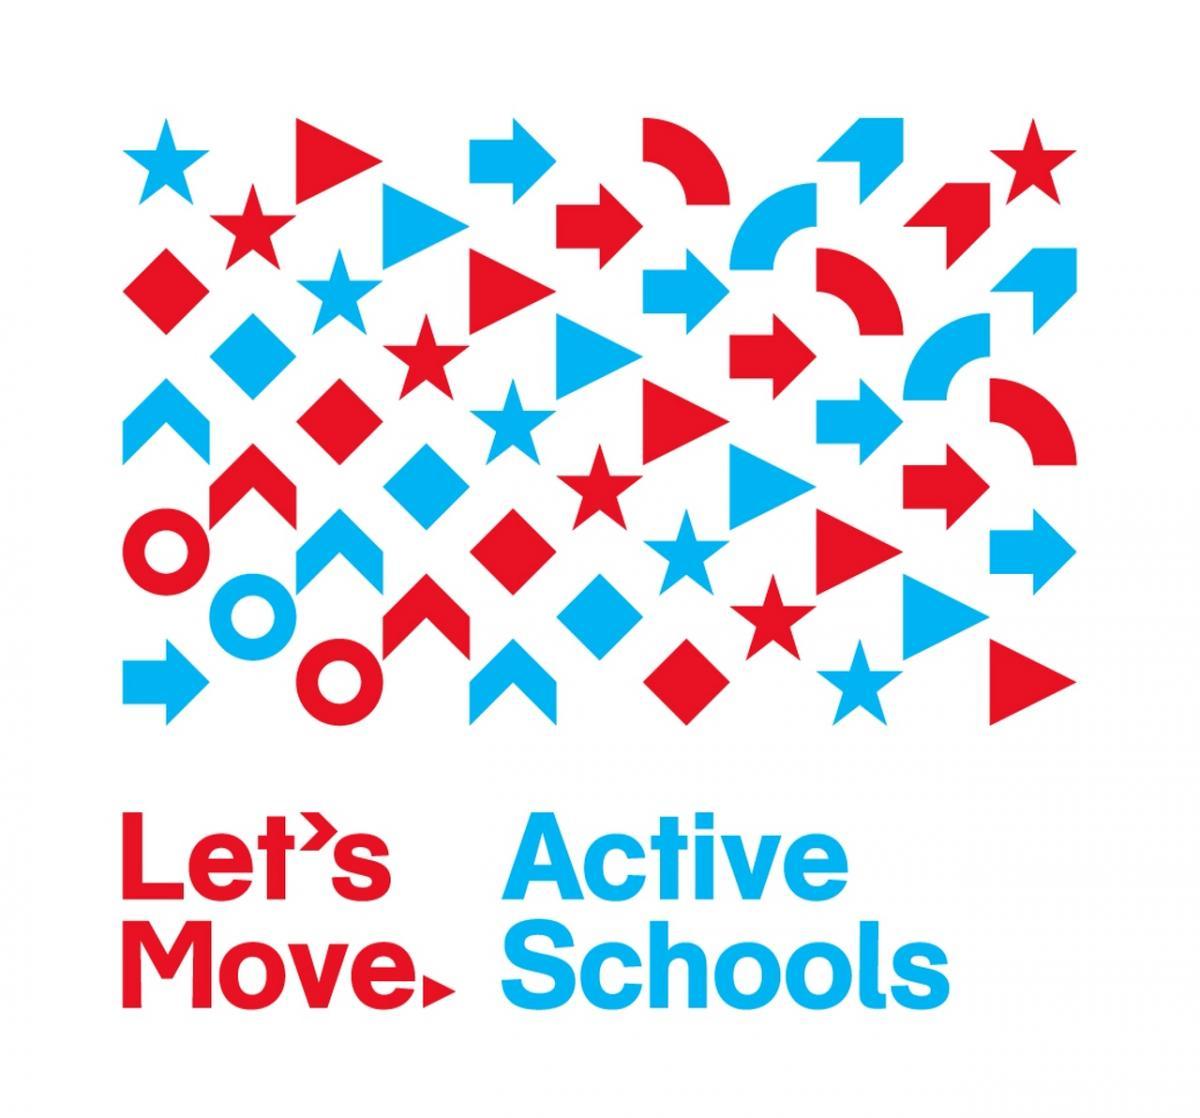 Let's Move Program